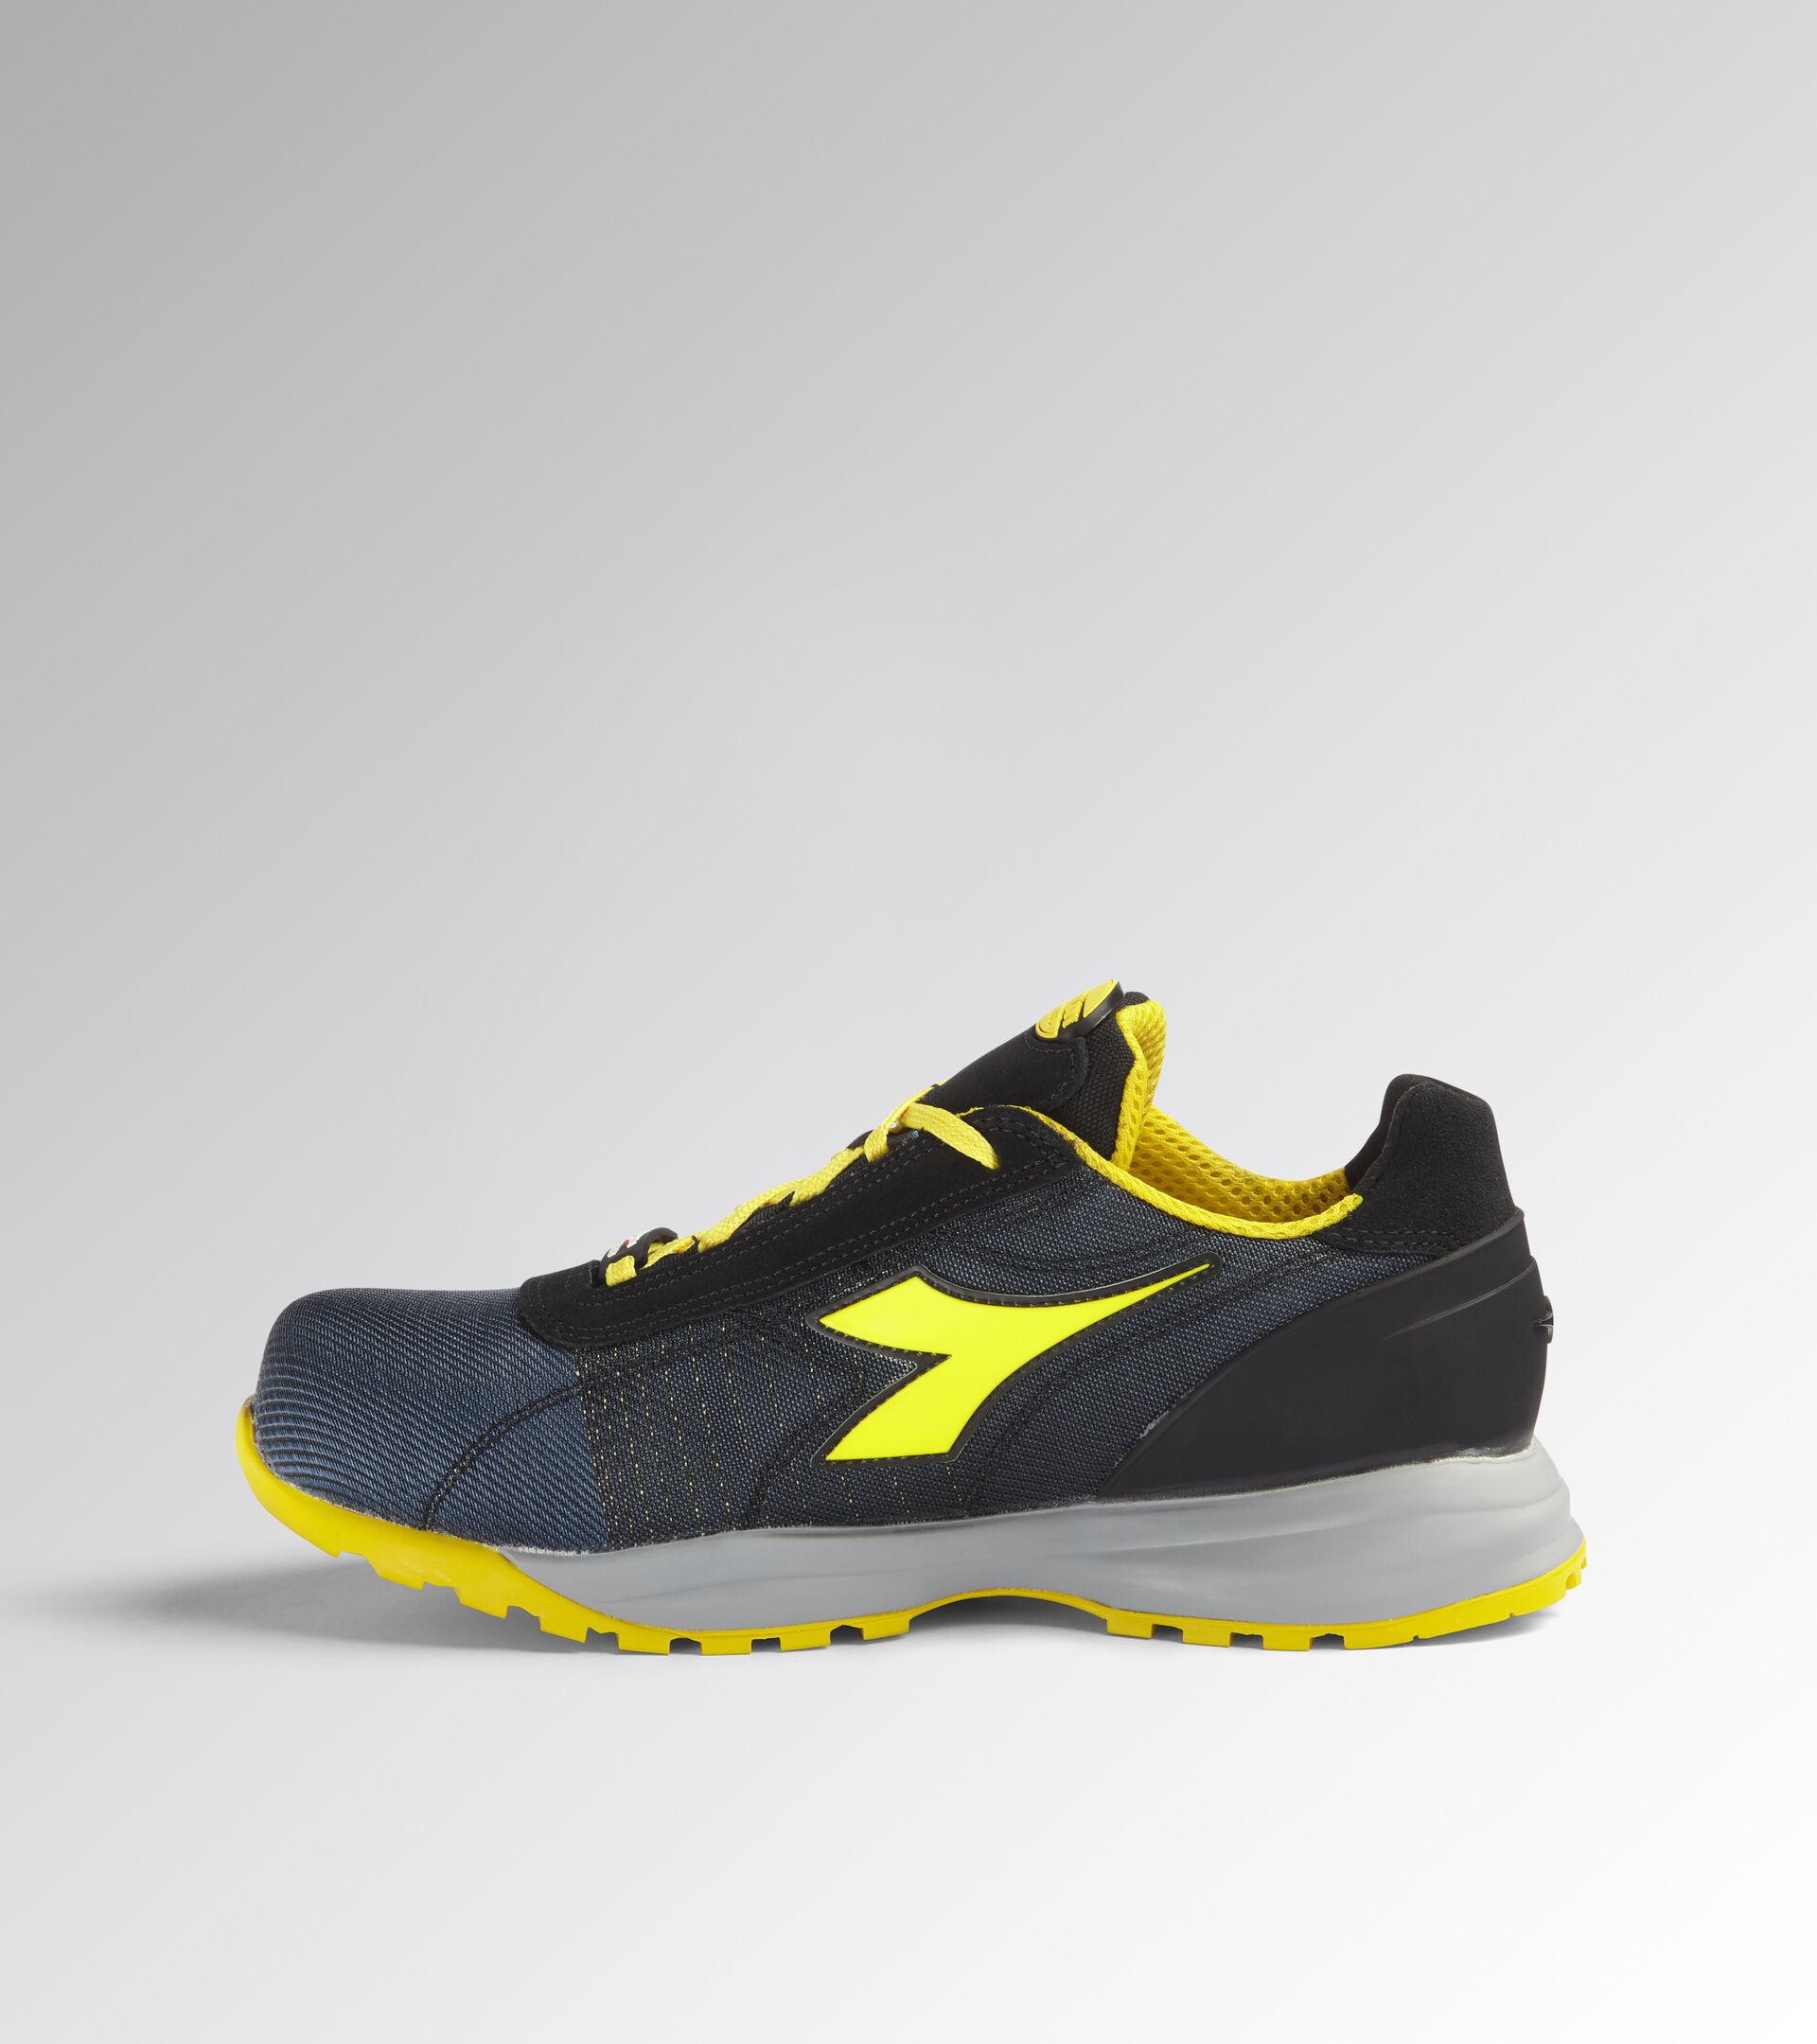 Footwear Utility UNISEX GLOVE MDS MATRYX LOW S1P HRO SRC CLASSIC NAVY/YELLOW Utility